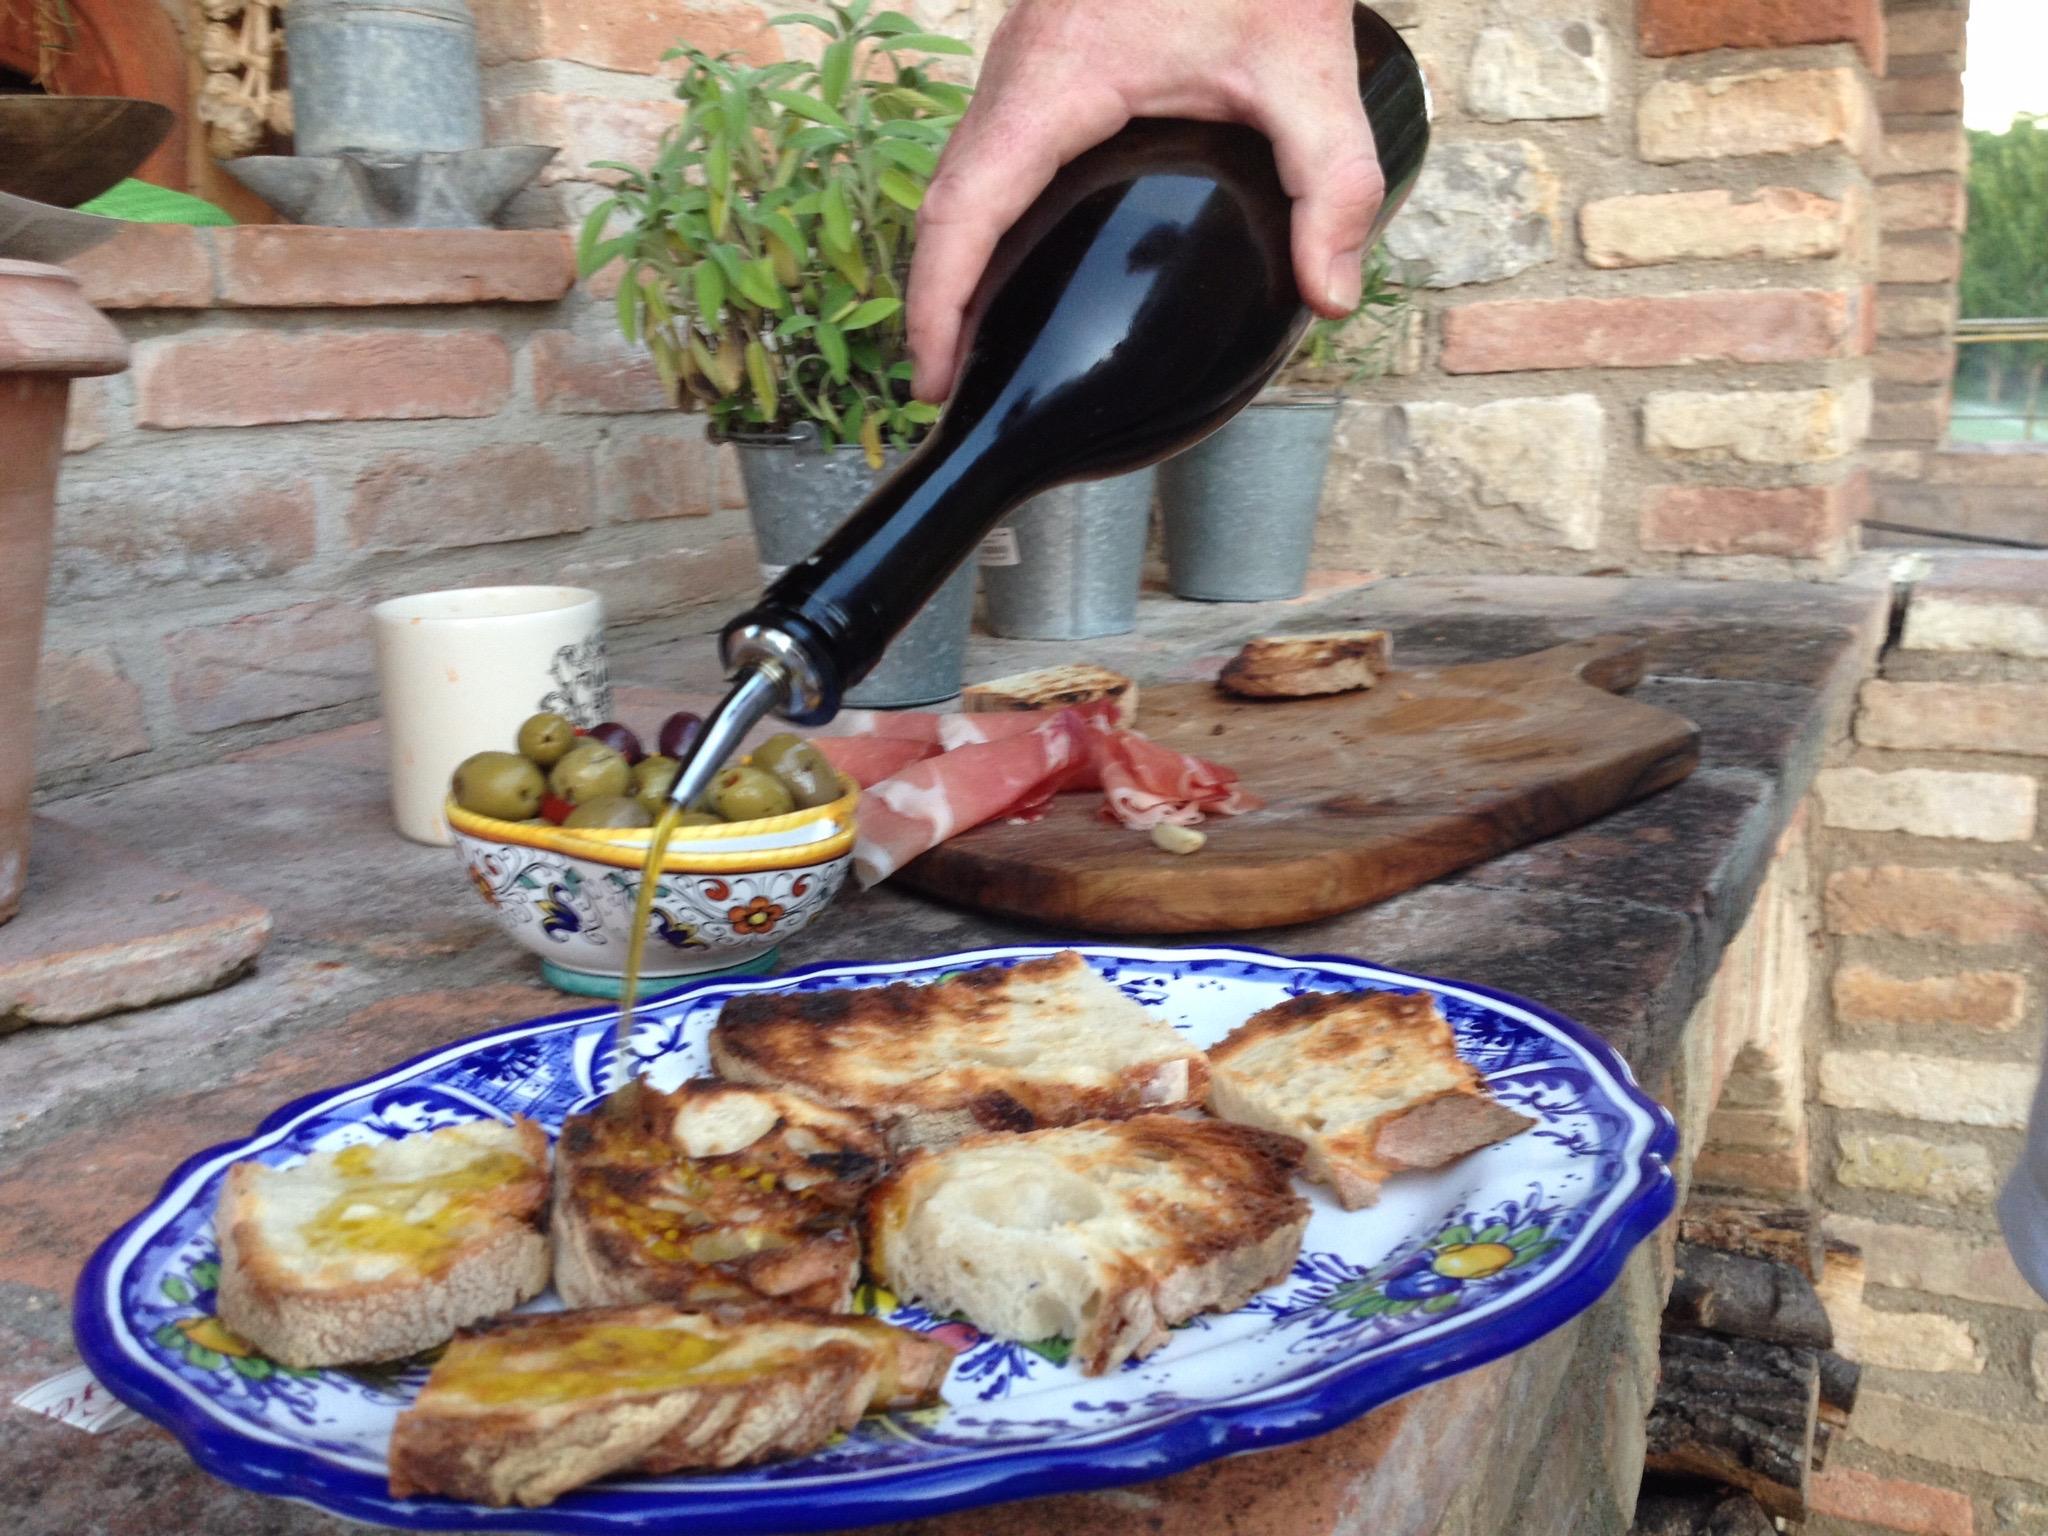 Crusty bread with olive oil, fresh garlic, and sea salt